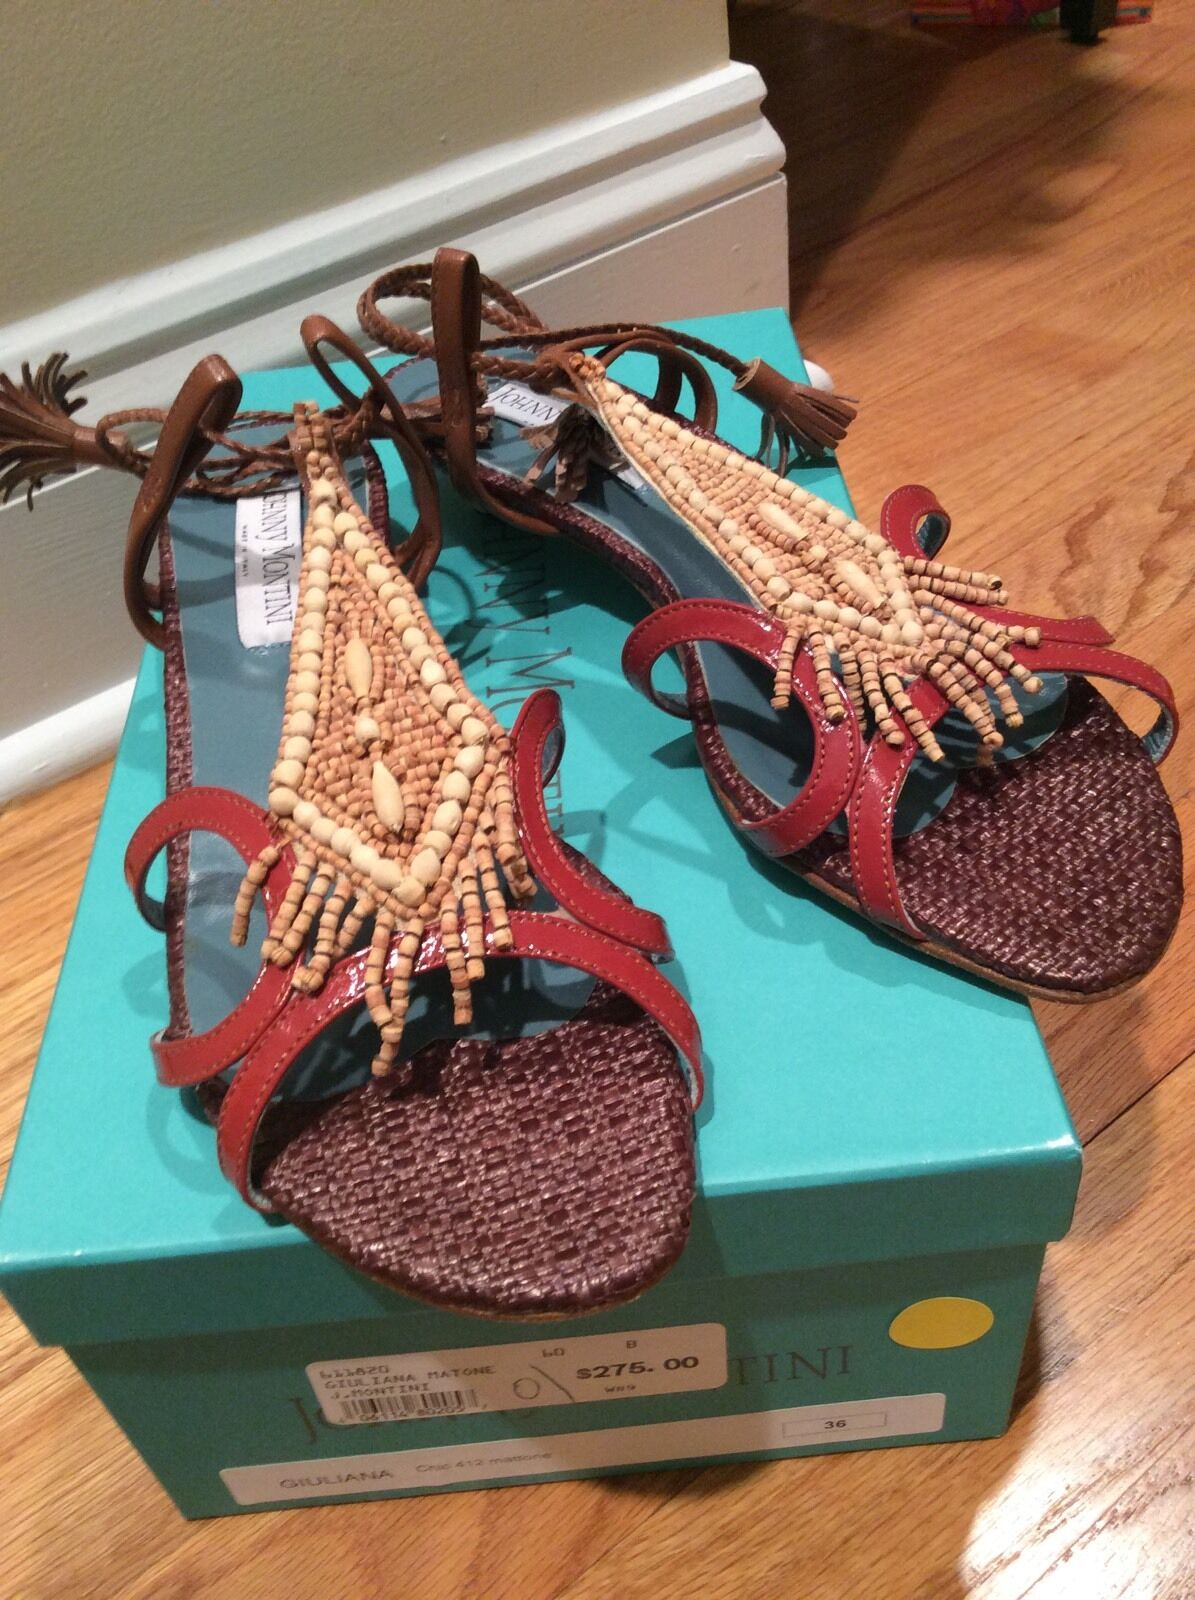 Brand New Johnny Montini Dimensione 6 36 Sandal